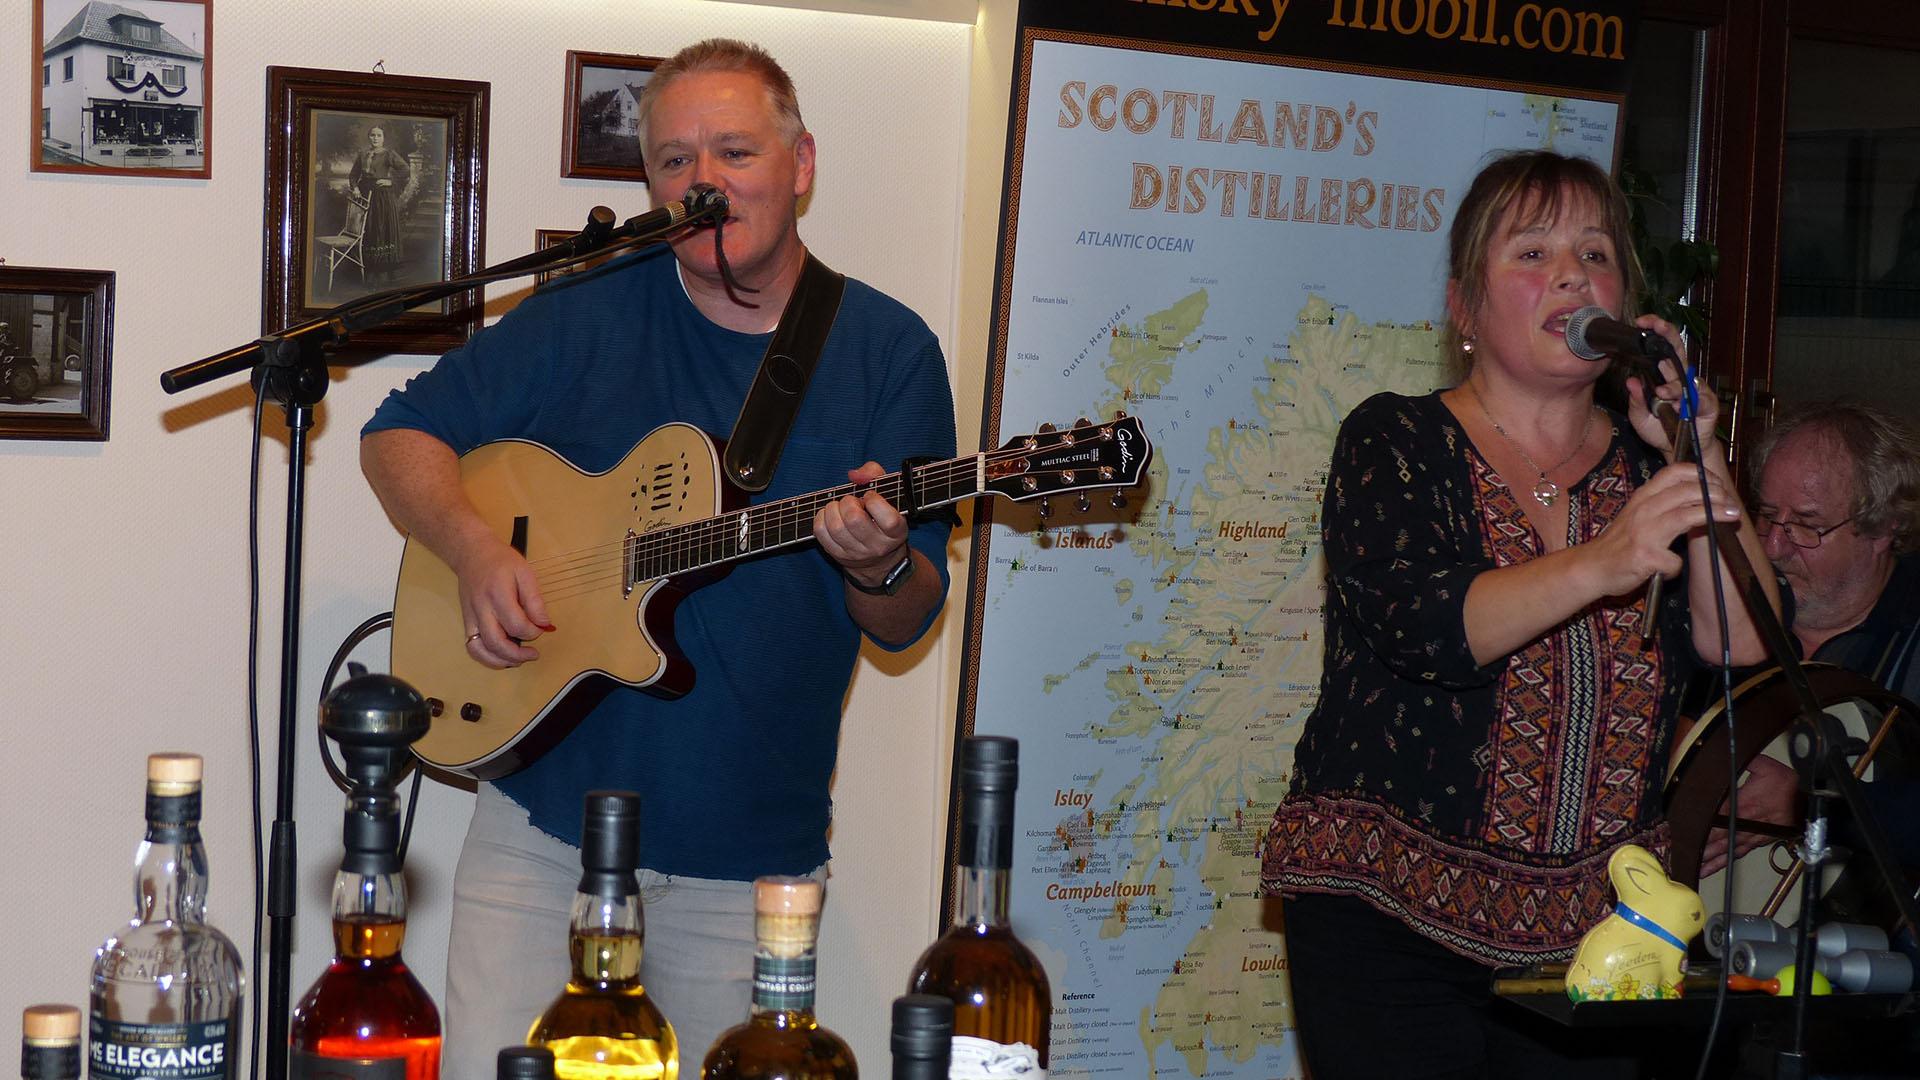 Celtic Tree live beim Whiskytasting. Hintergrund Plakat